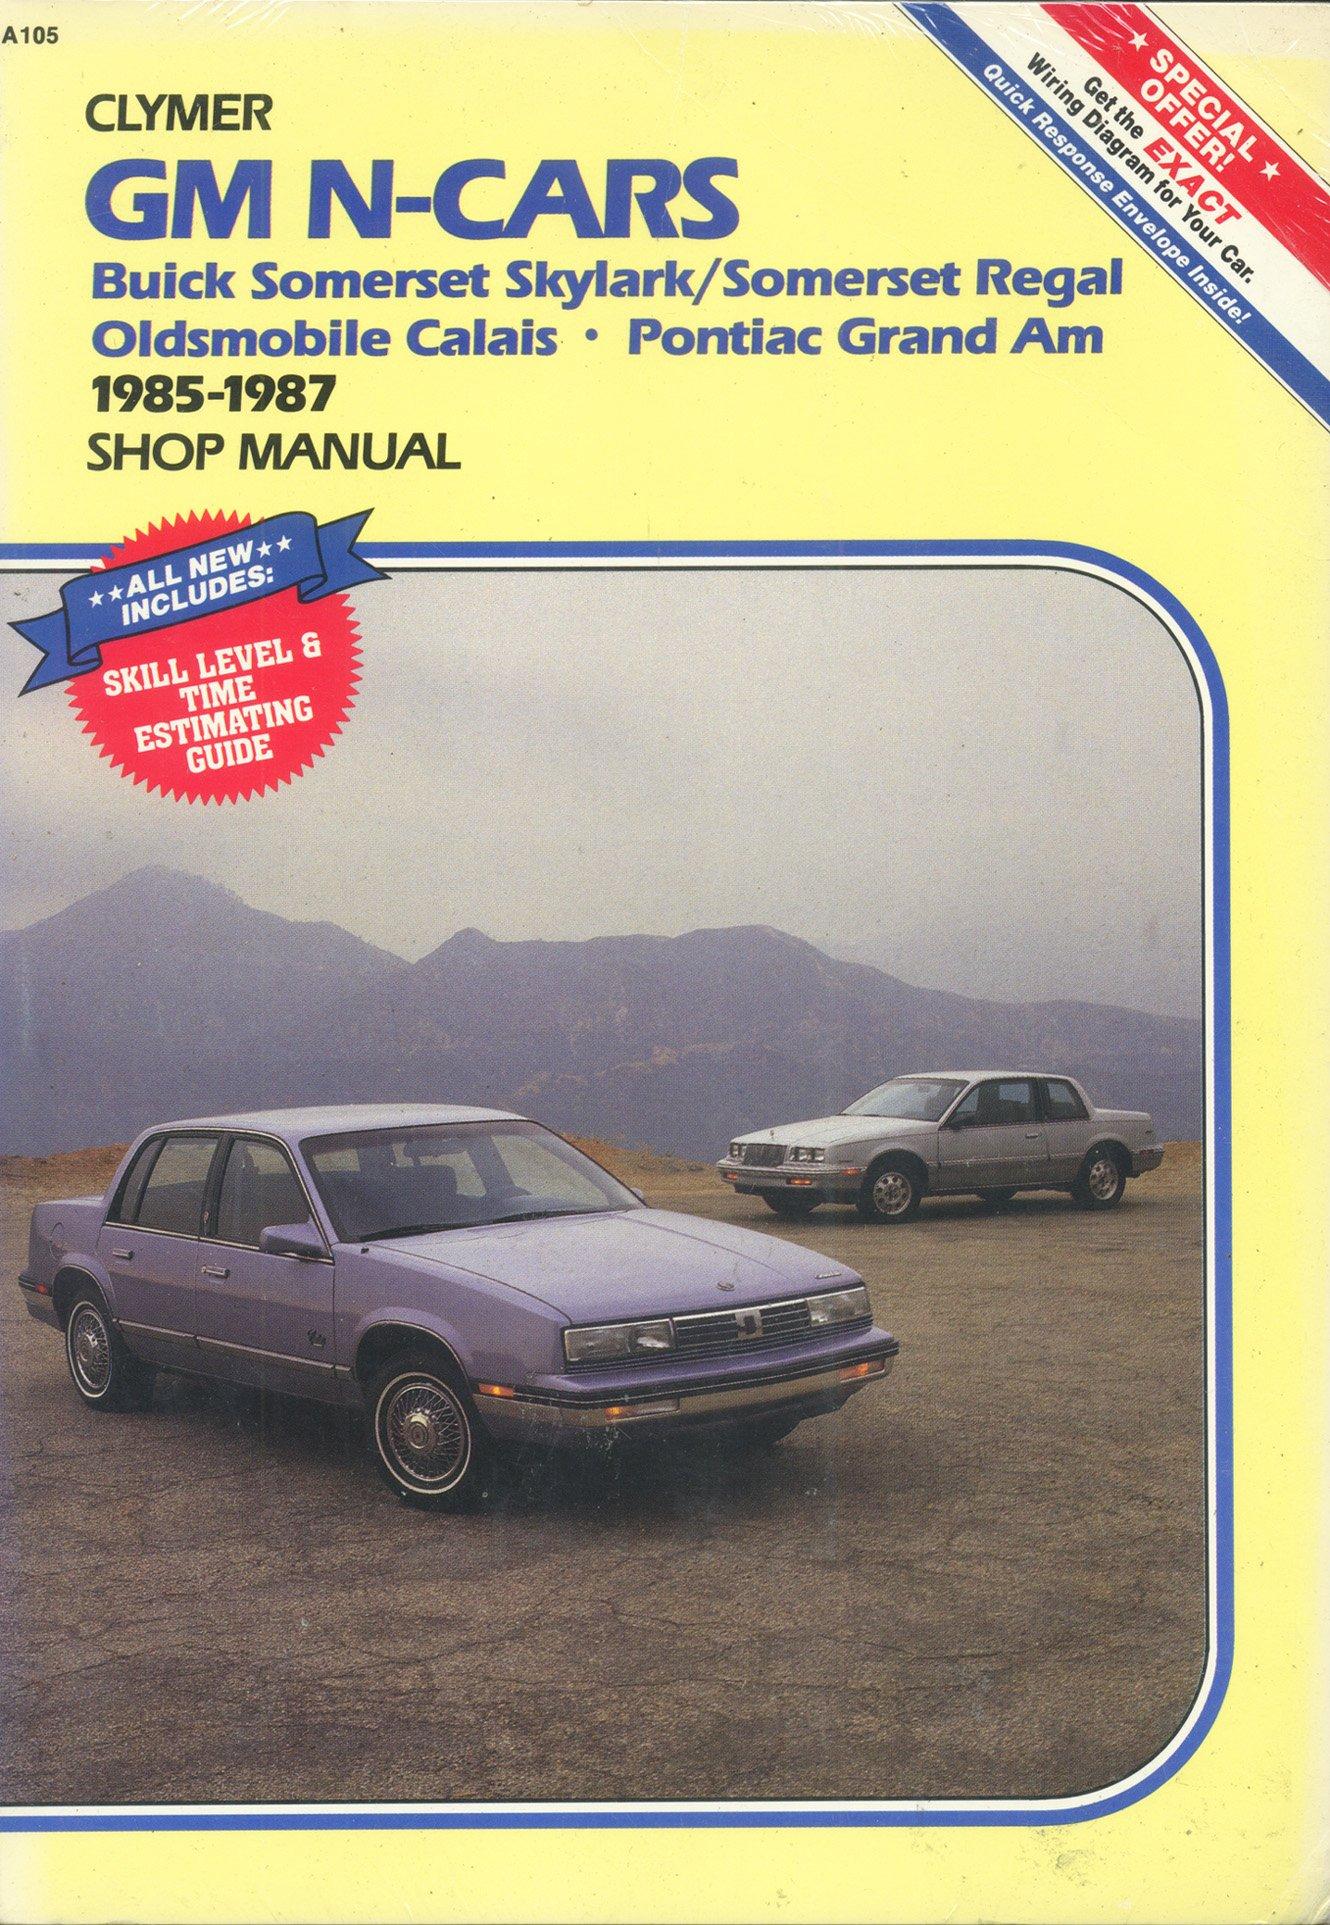 Gm N Cars Buick Somerset Skylark Regal Oldsmobile Calais 1991 Wiring Diagram Pontiac Grand Am 1985 1987 Shop Manual Kalton C Lahue 9780892874514